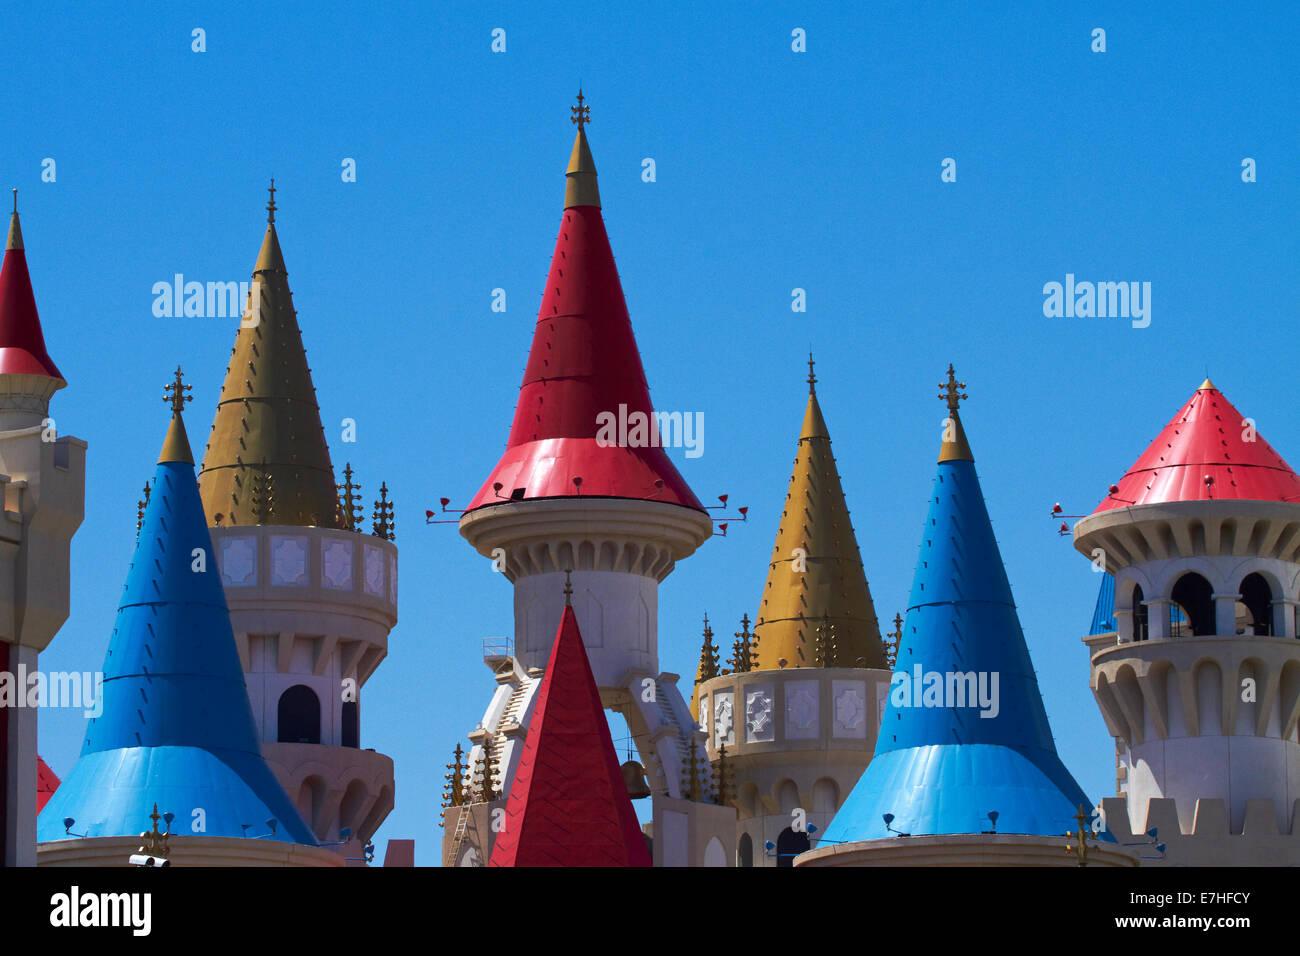 Turrets of Excalibur Hotel and Casino, Las Vegas, Nevada, USA - Stock Image